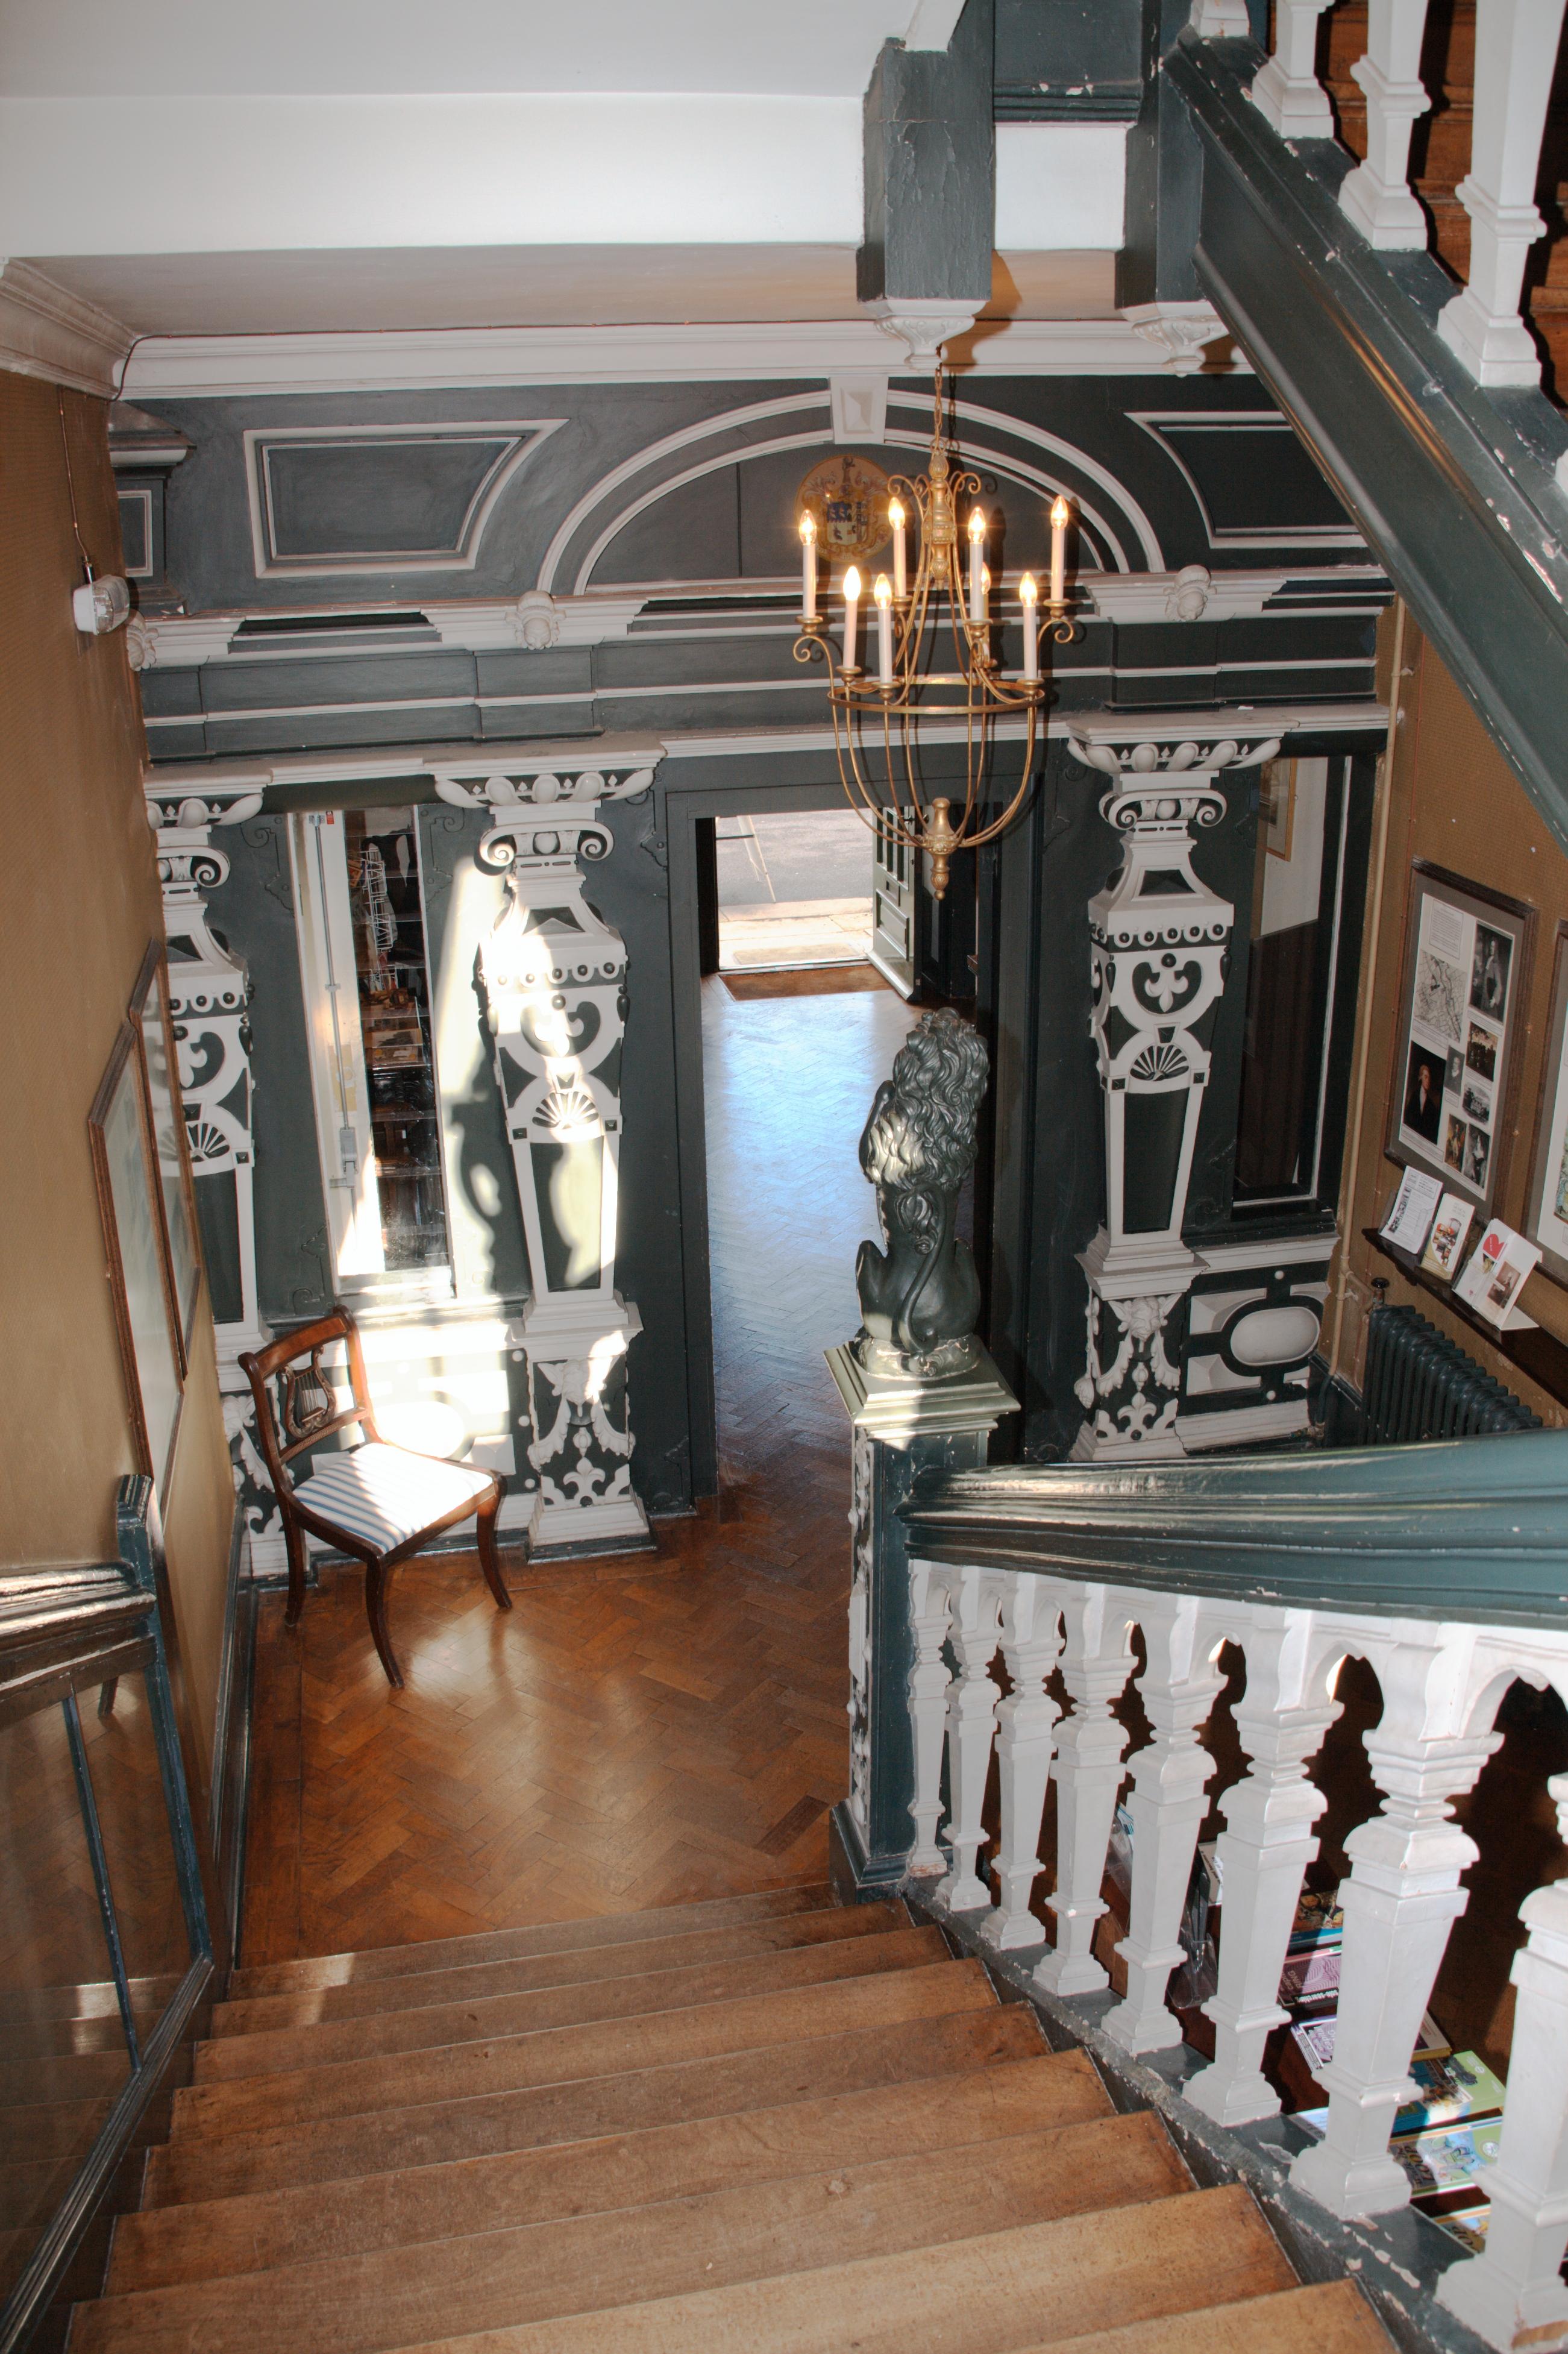 File:Boston manor house stairs 3087alt.jpg - Wikimedia Commons